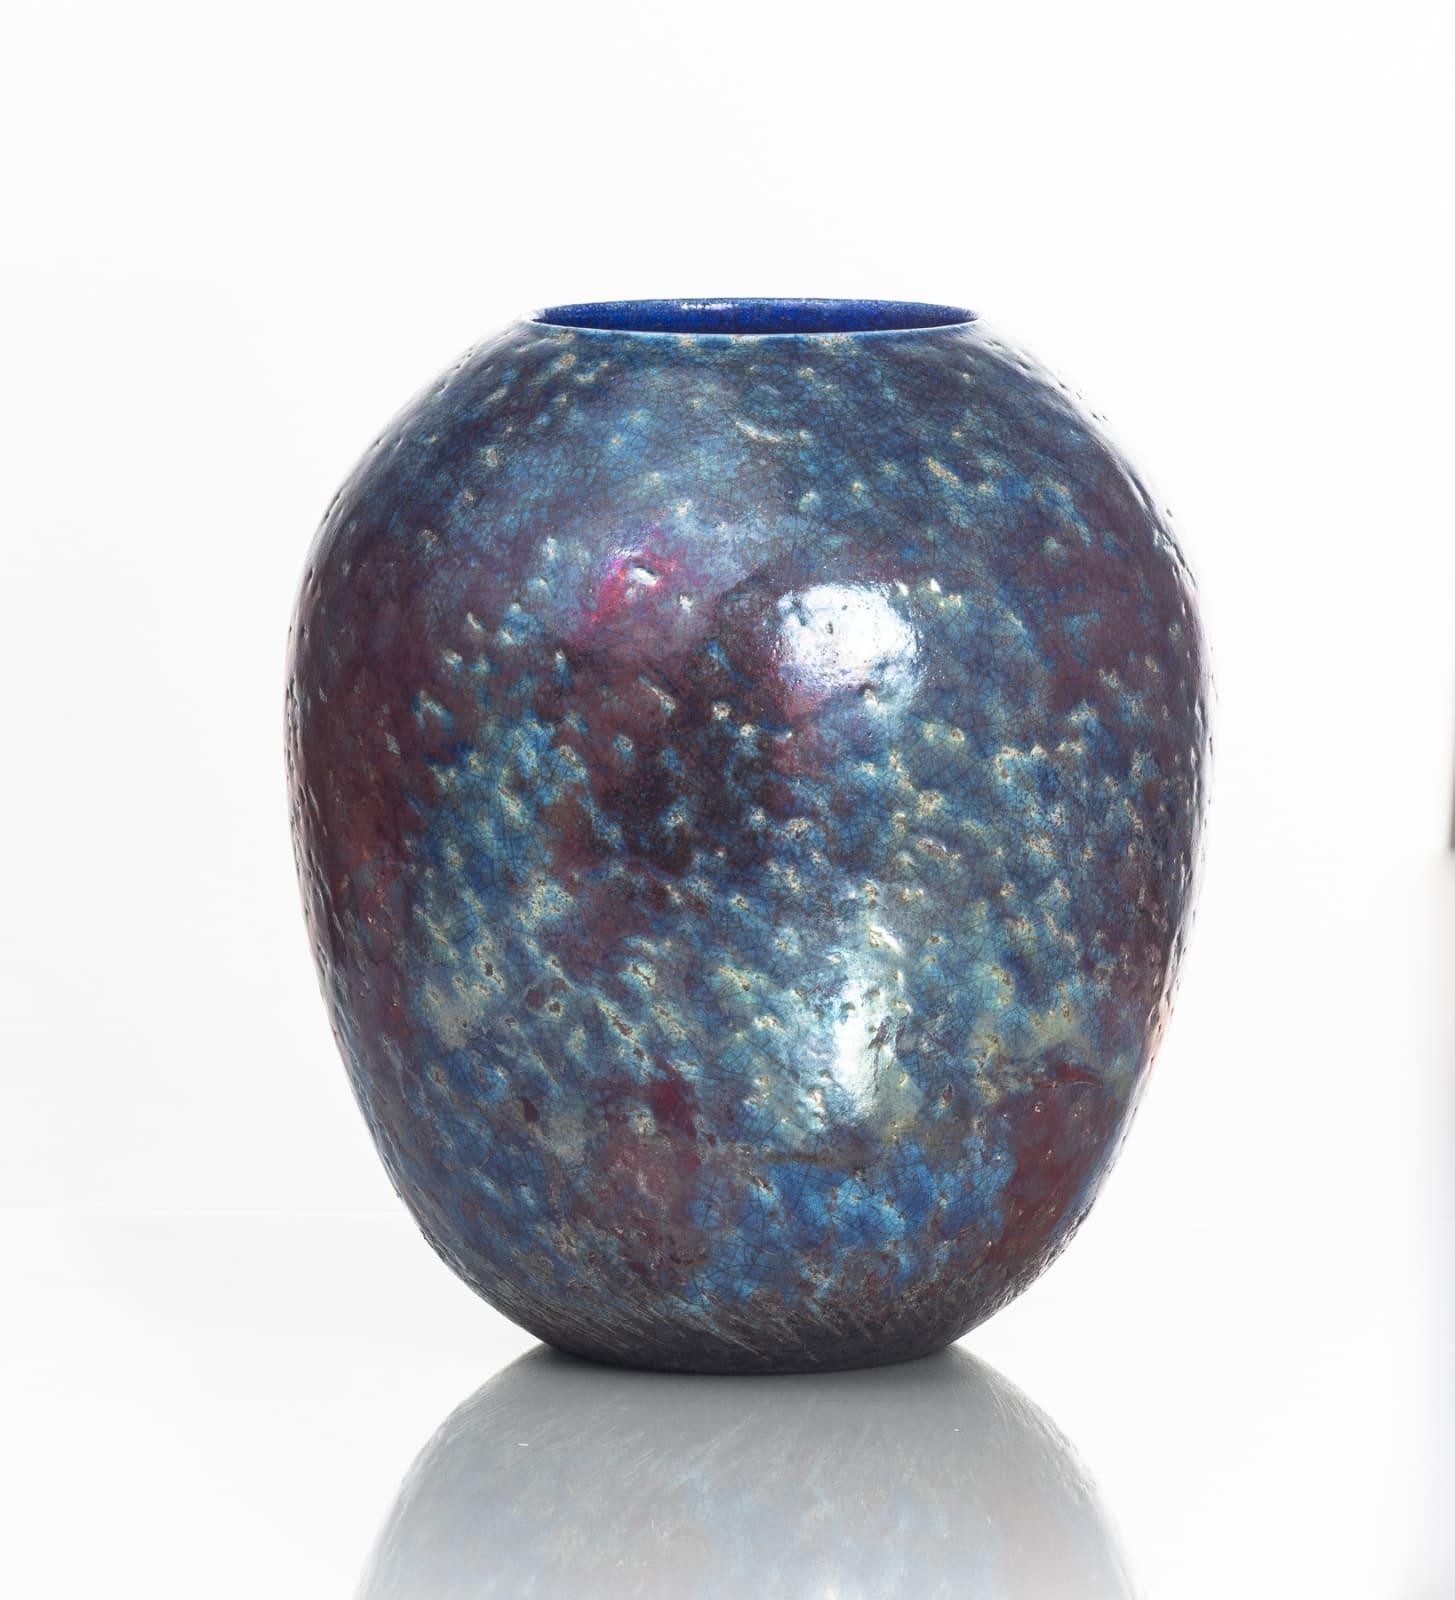 Neill Curran, Dark Blue & Copper Vessel, 2019